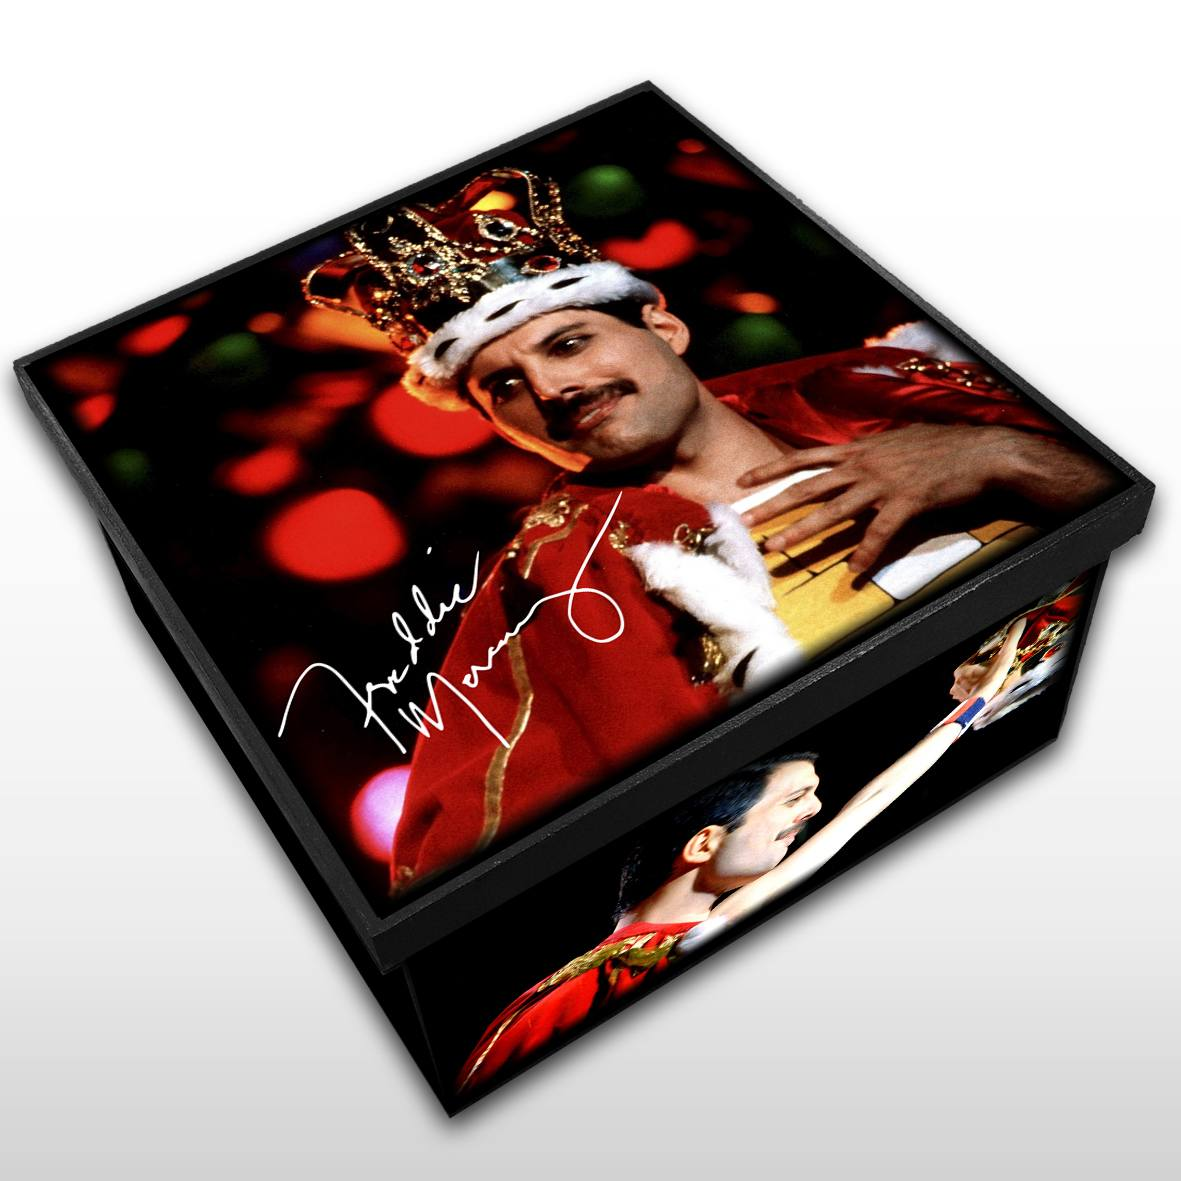 Freddie Mercury - Queen - Caixa em MDF - Tam. Médio - Mr. Rock